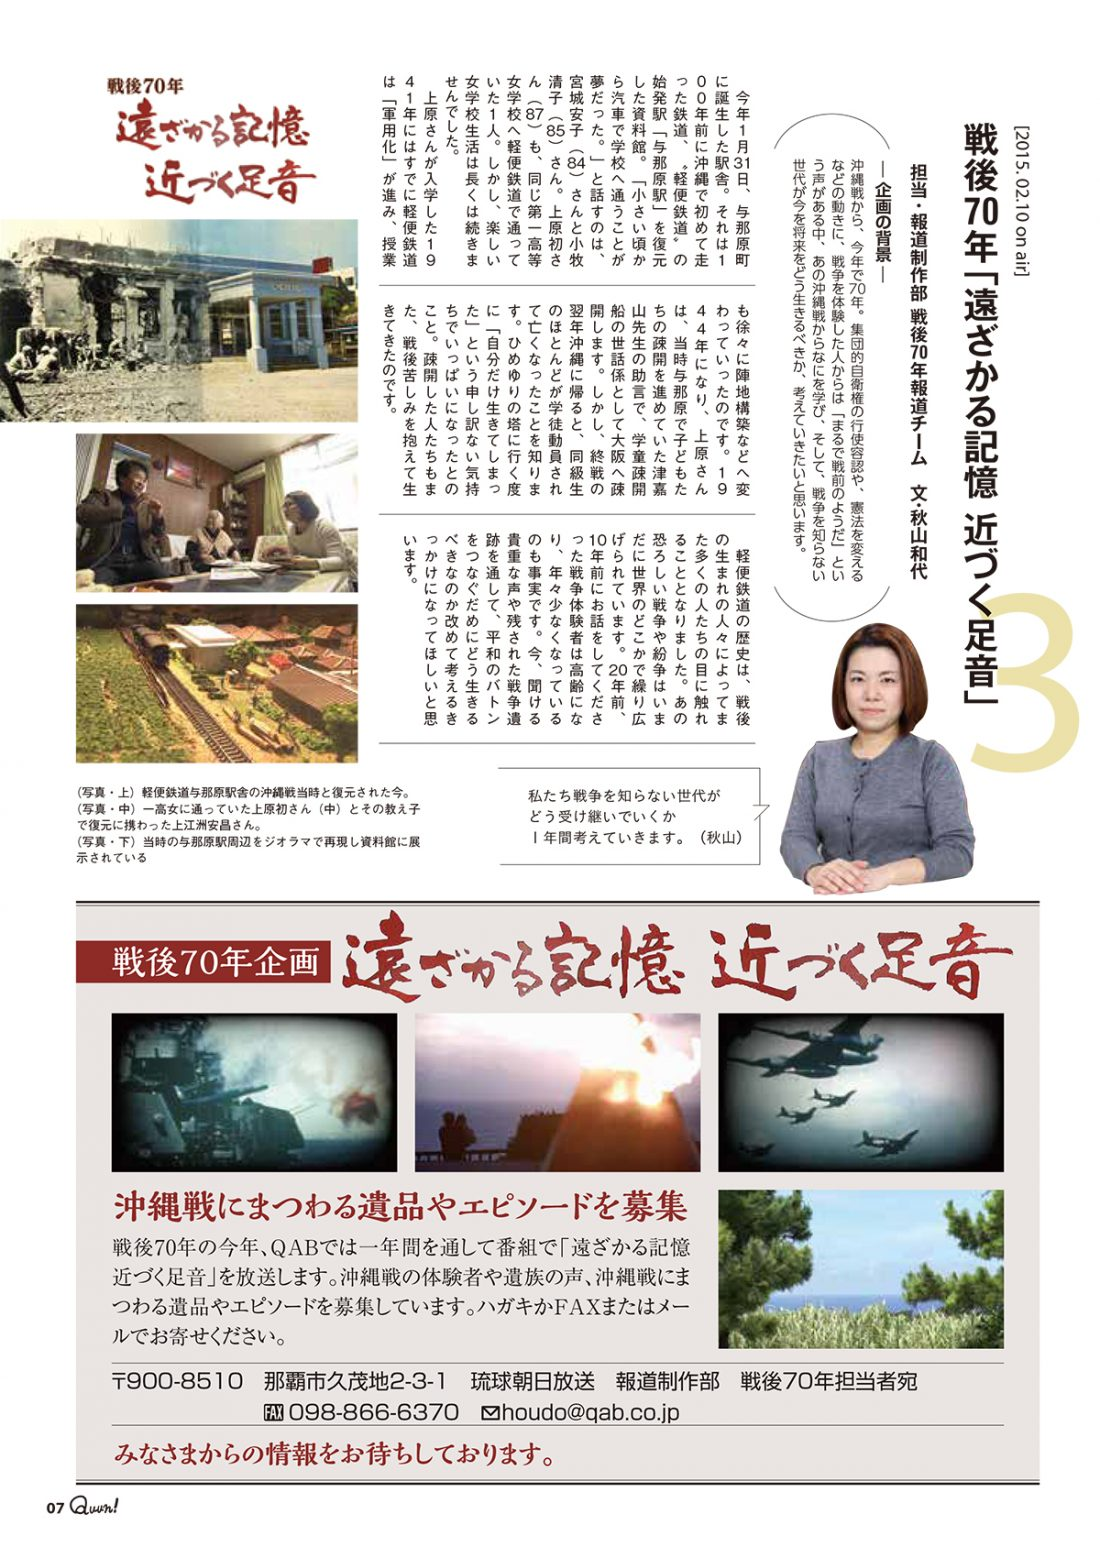 http://www.qab.co.jp/qgoro/wp-content/uploads/quun_0309-1100x1558.jpg